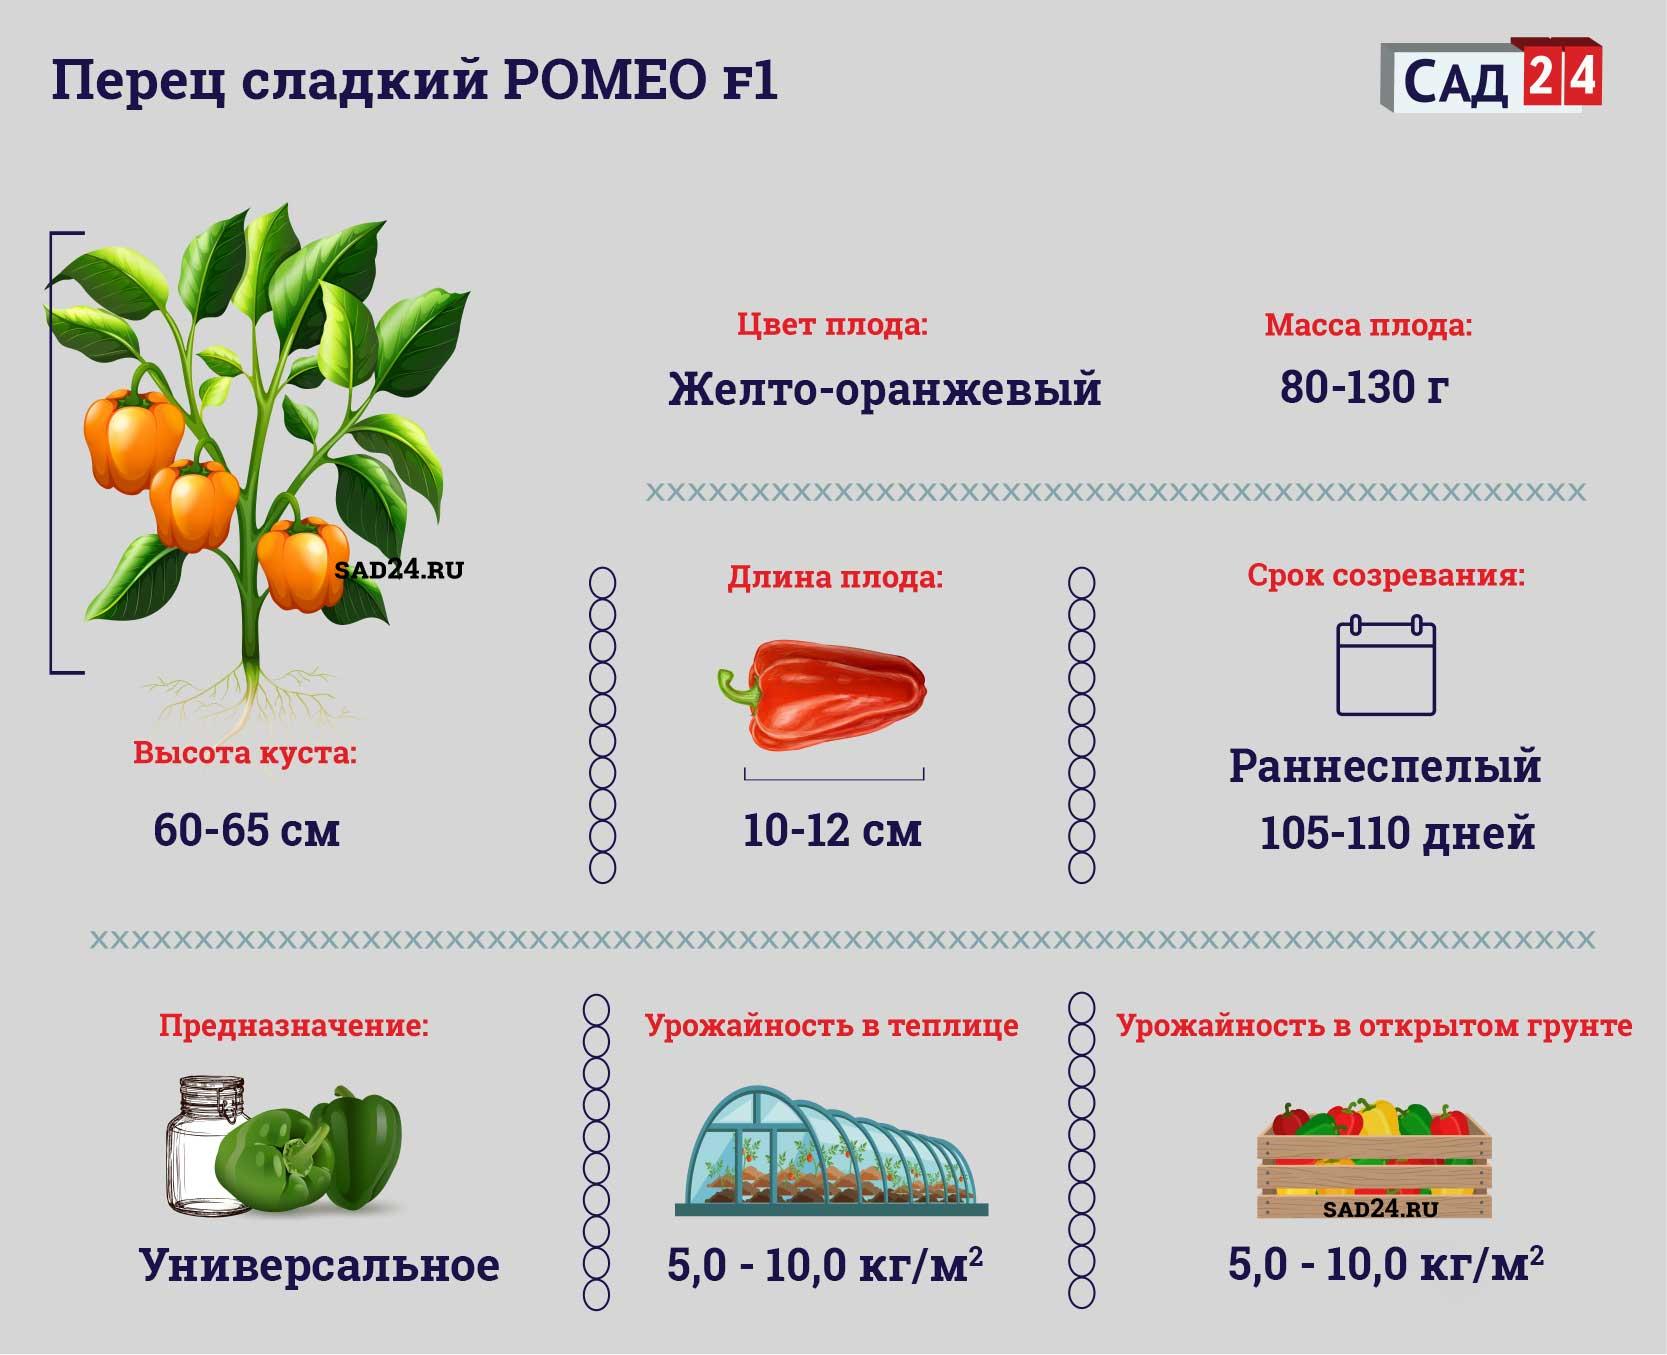 Ромео F1 - https://sad24.ru